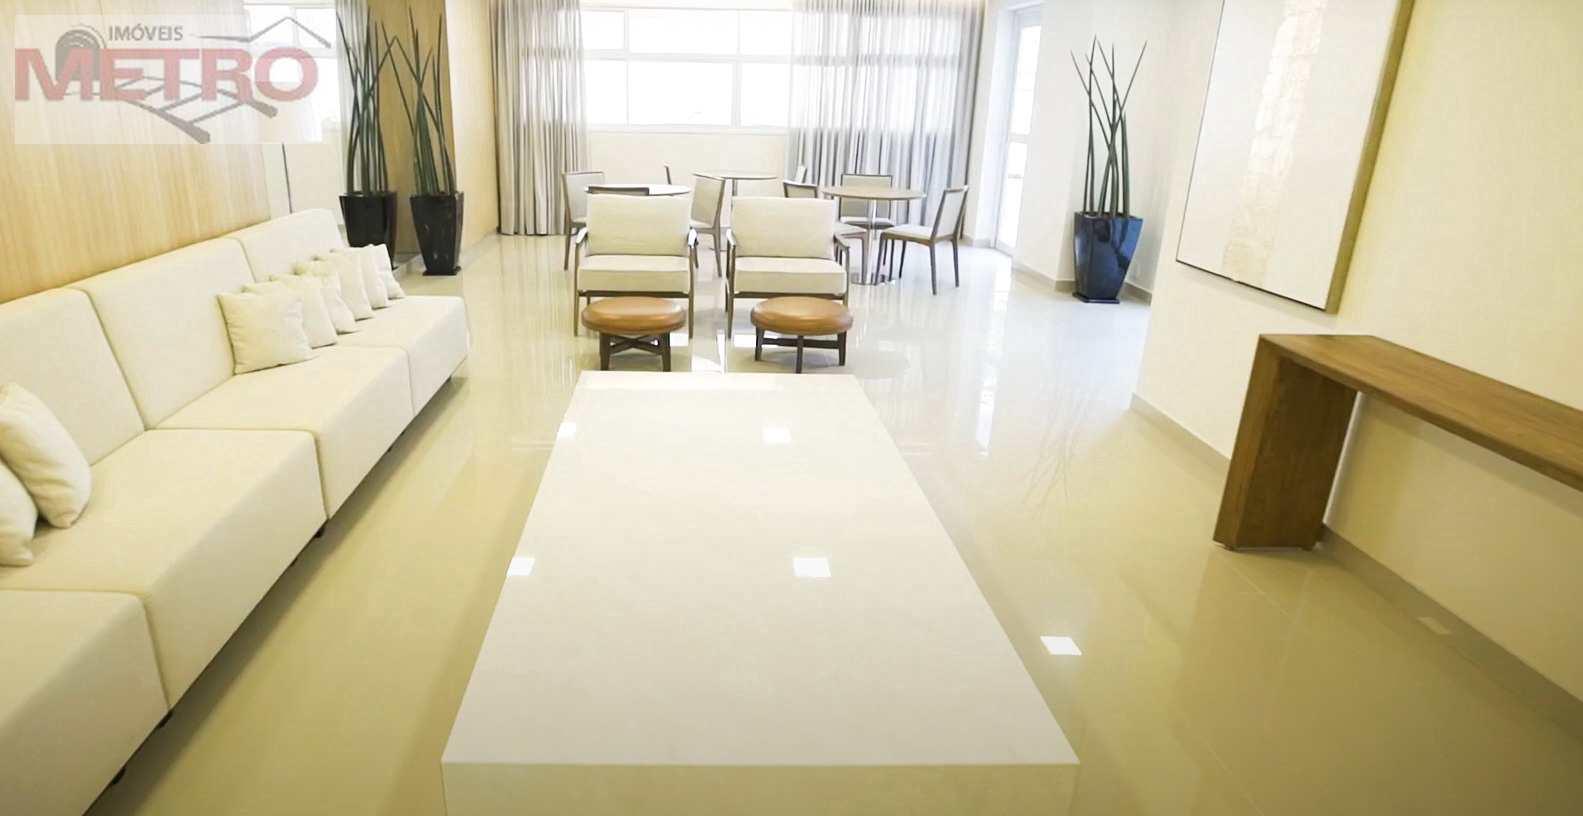 Apartamento com 2 dorms, Jardim Prudência, São Paulo - R$ 750 mil, Cod: 91194